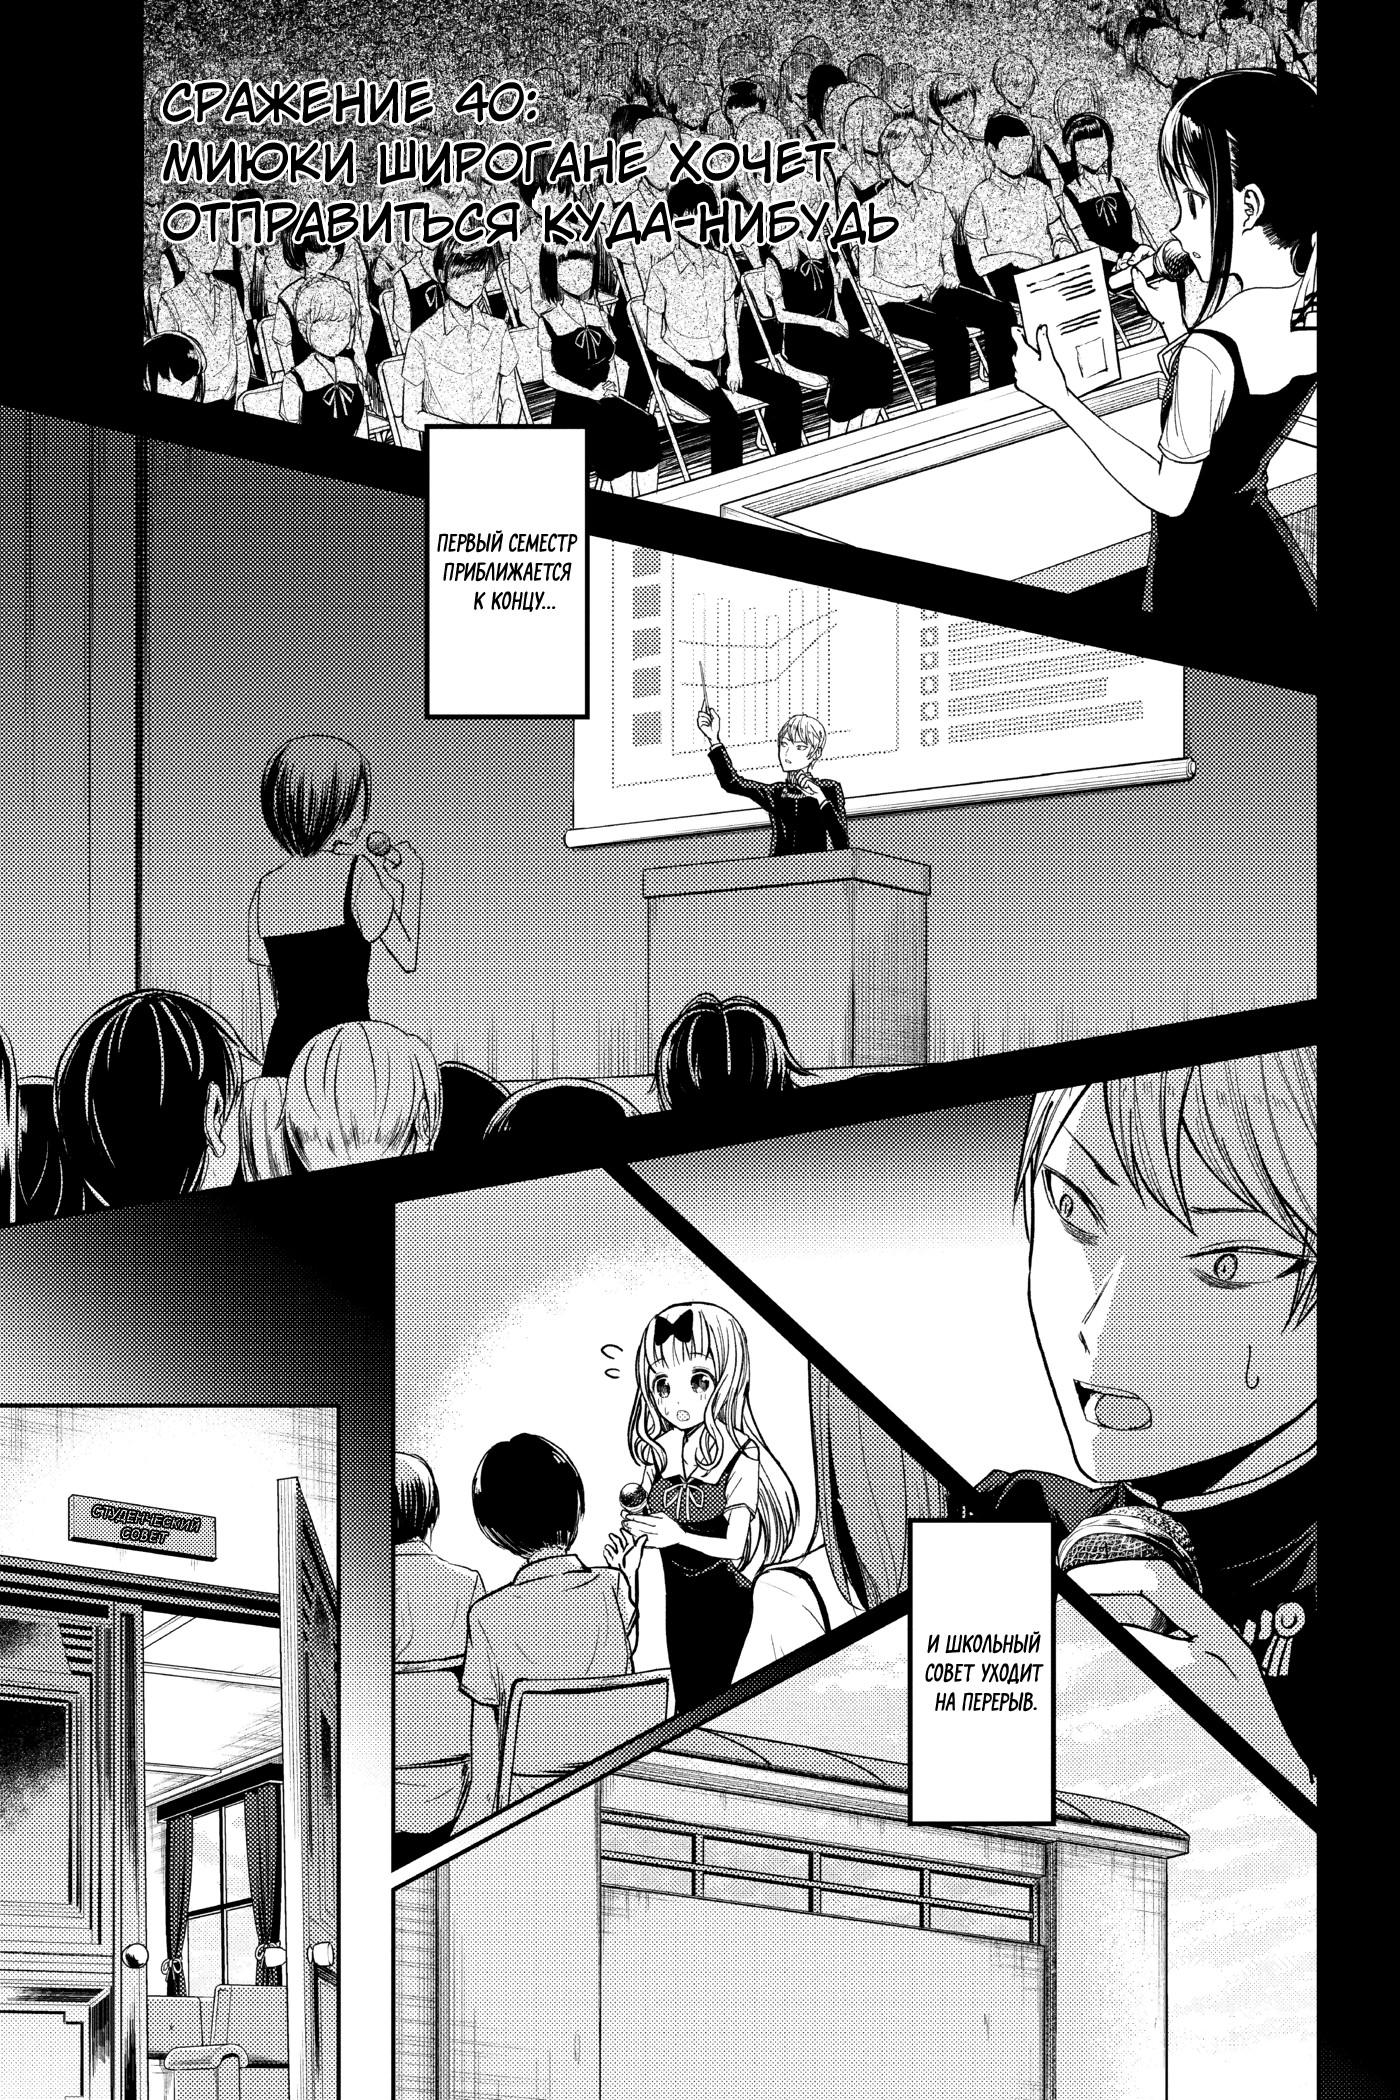 https://r2.ninemanga.com/comics/pic4/1/35137/1357486/1559914866117.jpg Page 1